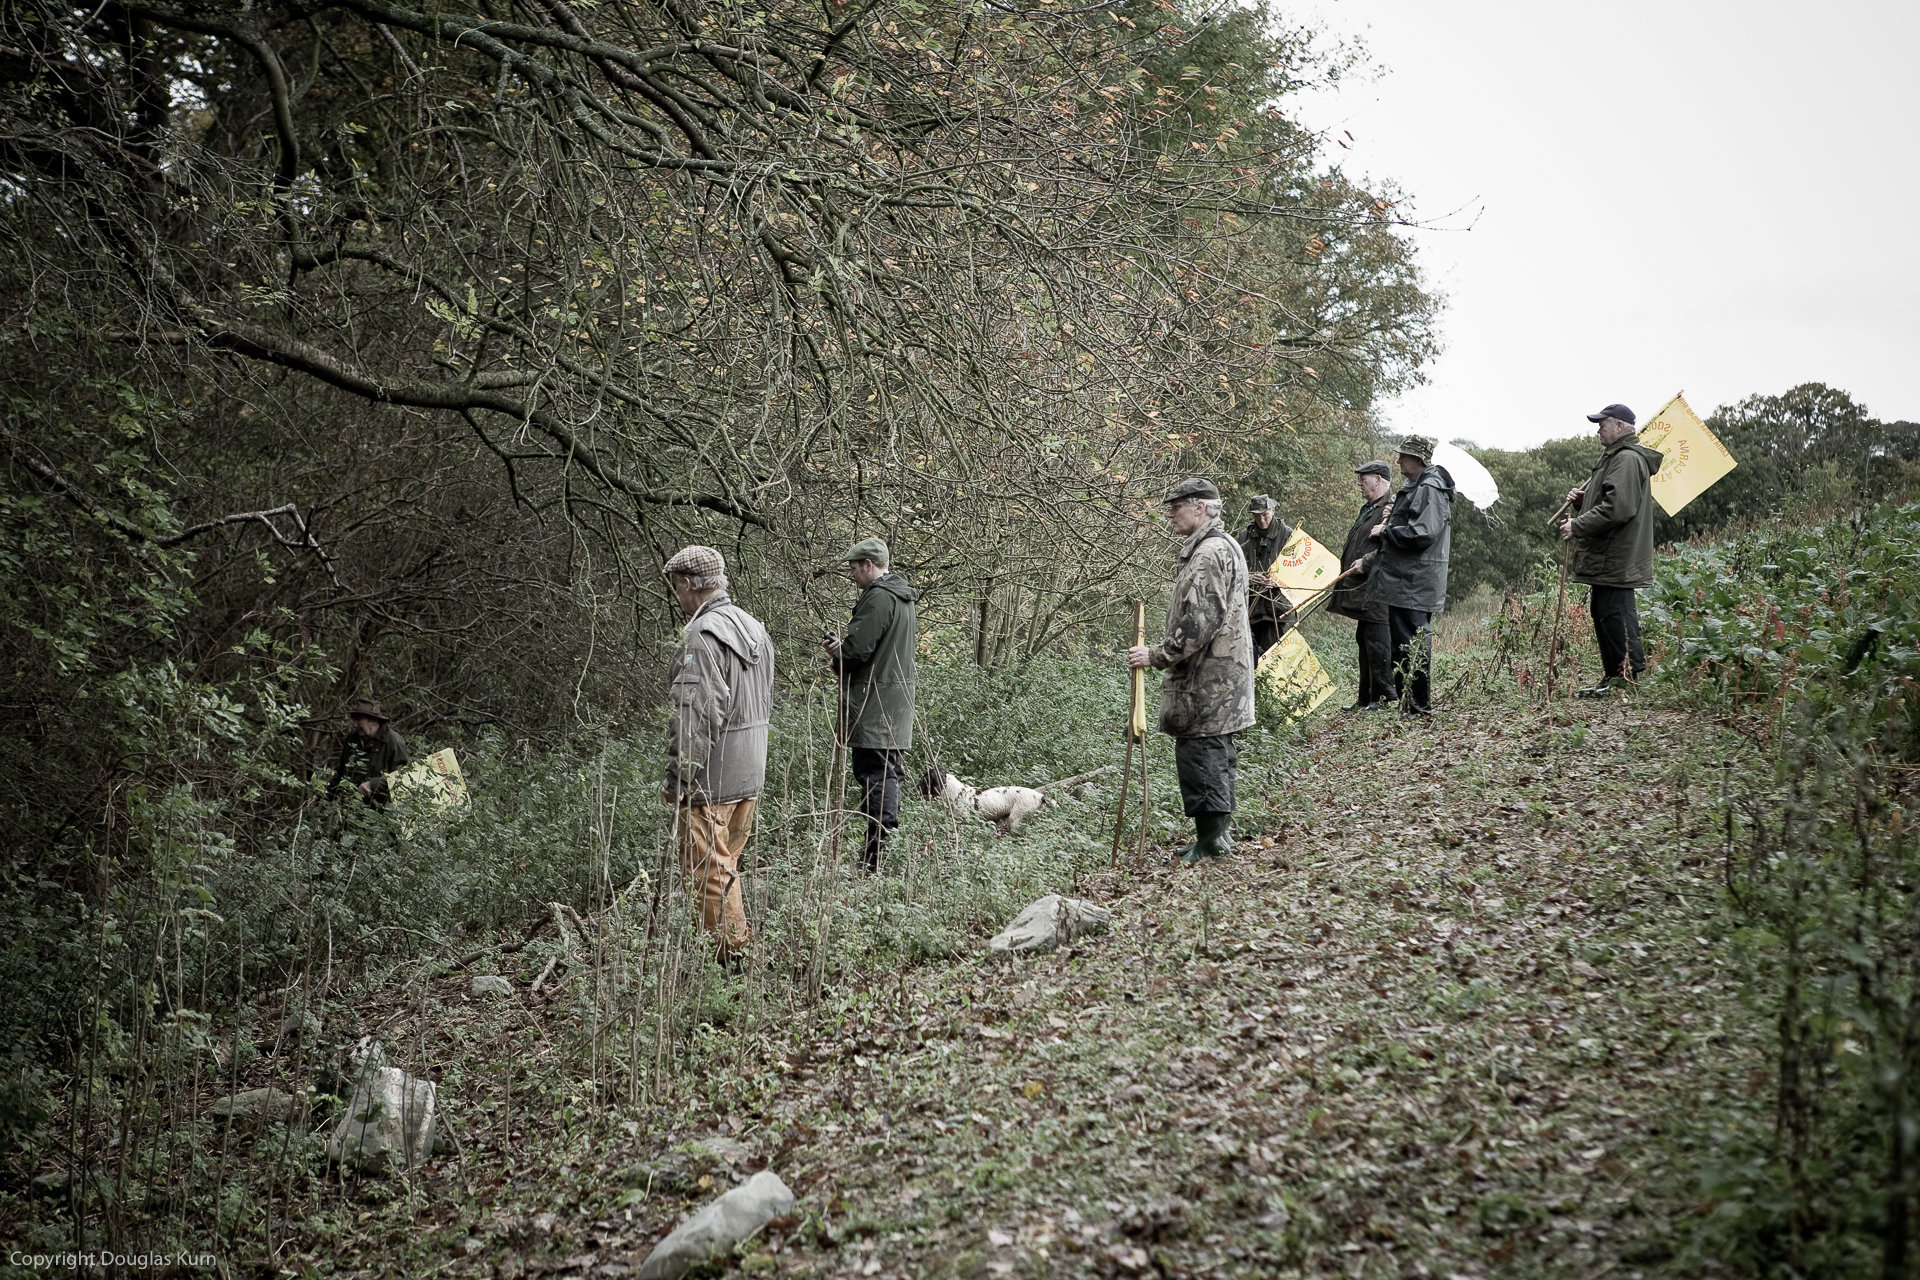 Nant Clwyd Shoot, November 3rd 2005